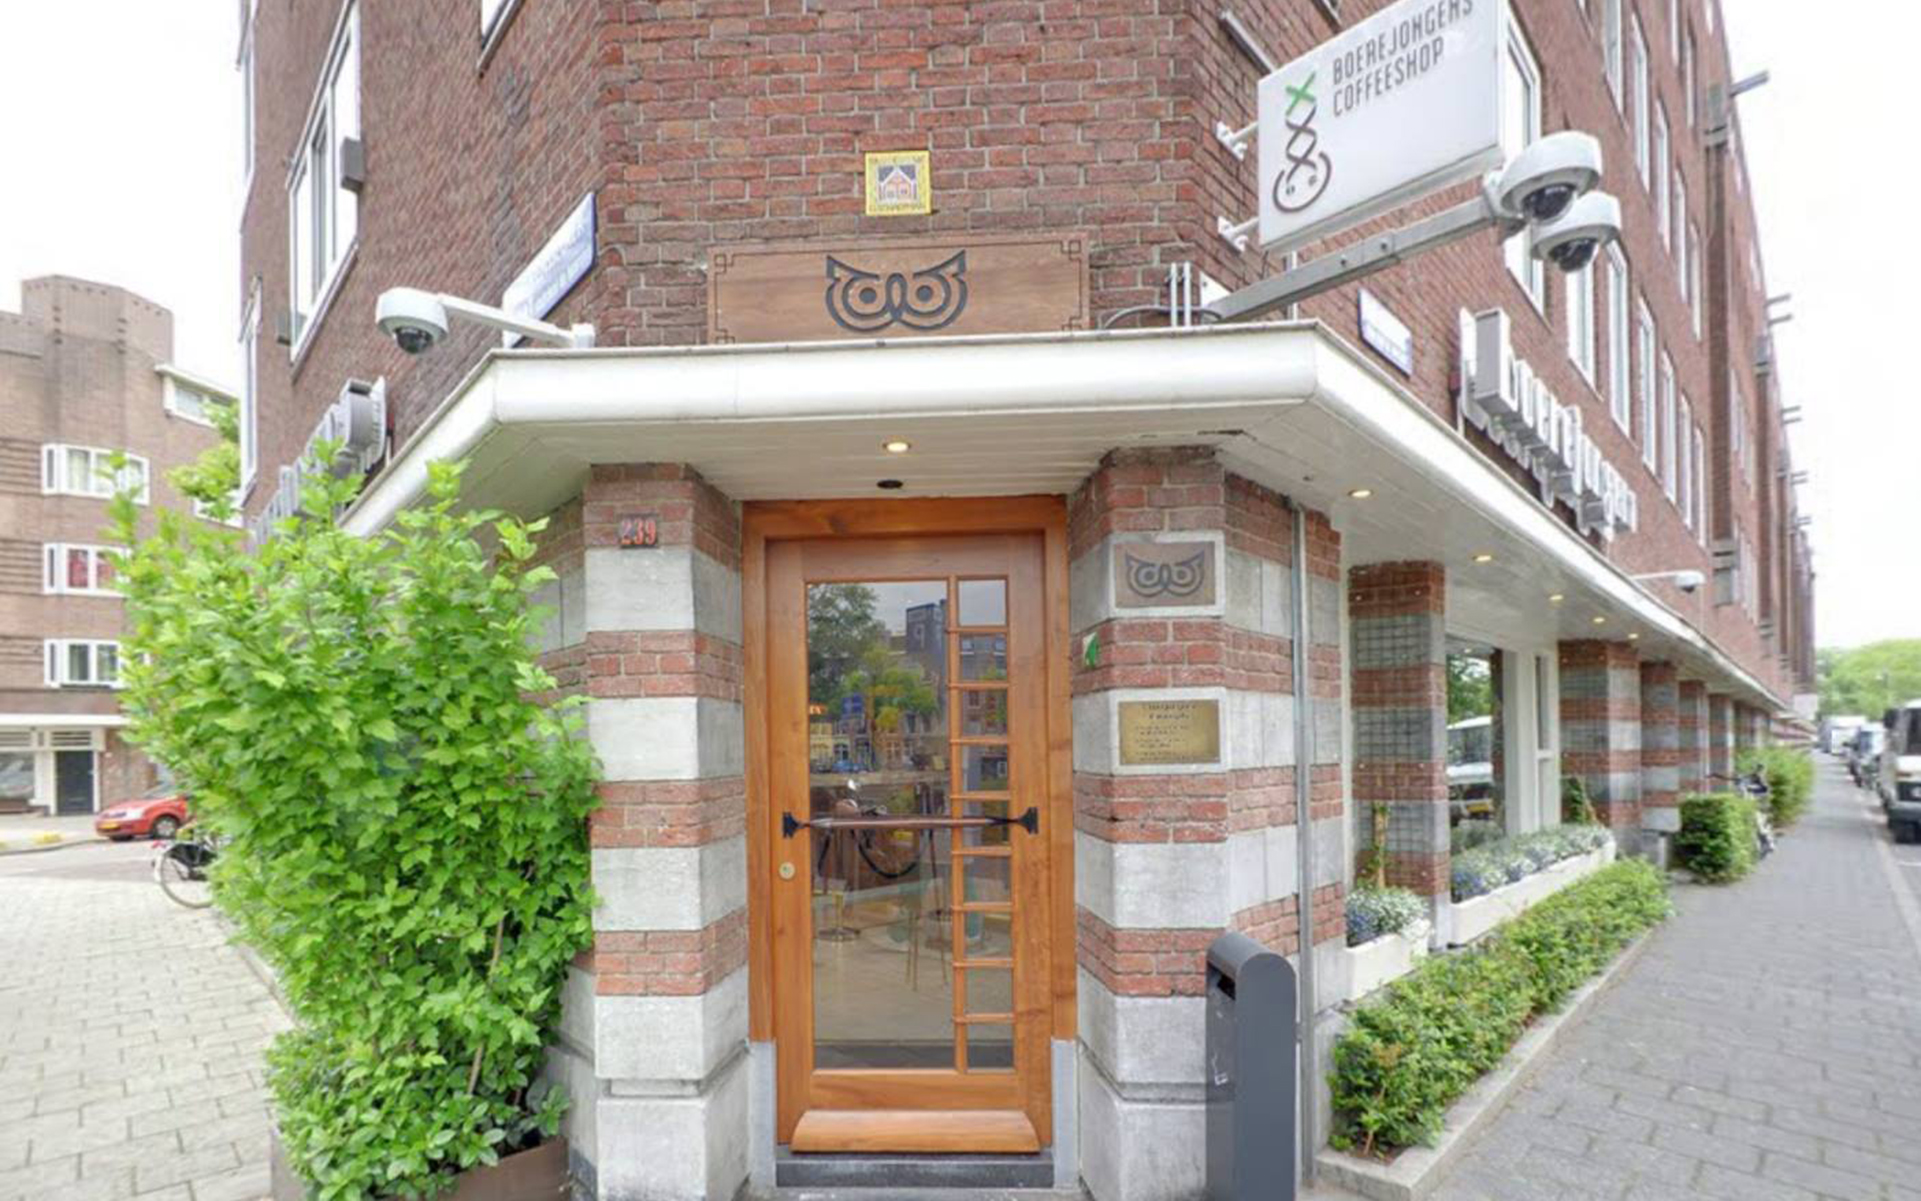 Amsterdam Cannabis Coffeeshop: Boerejongens